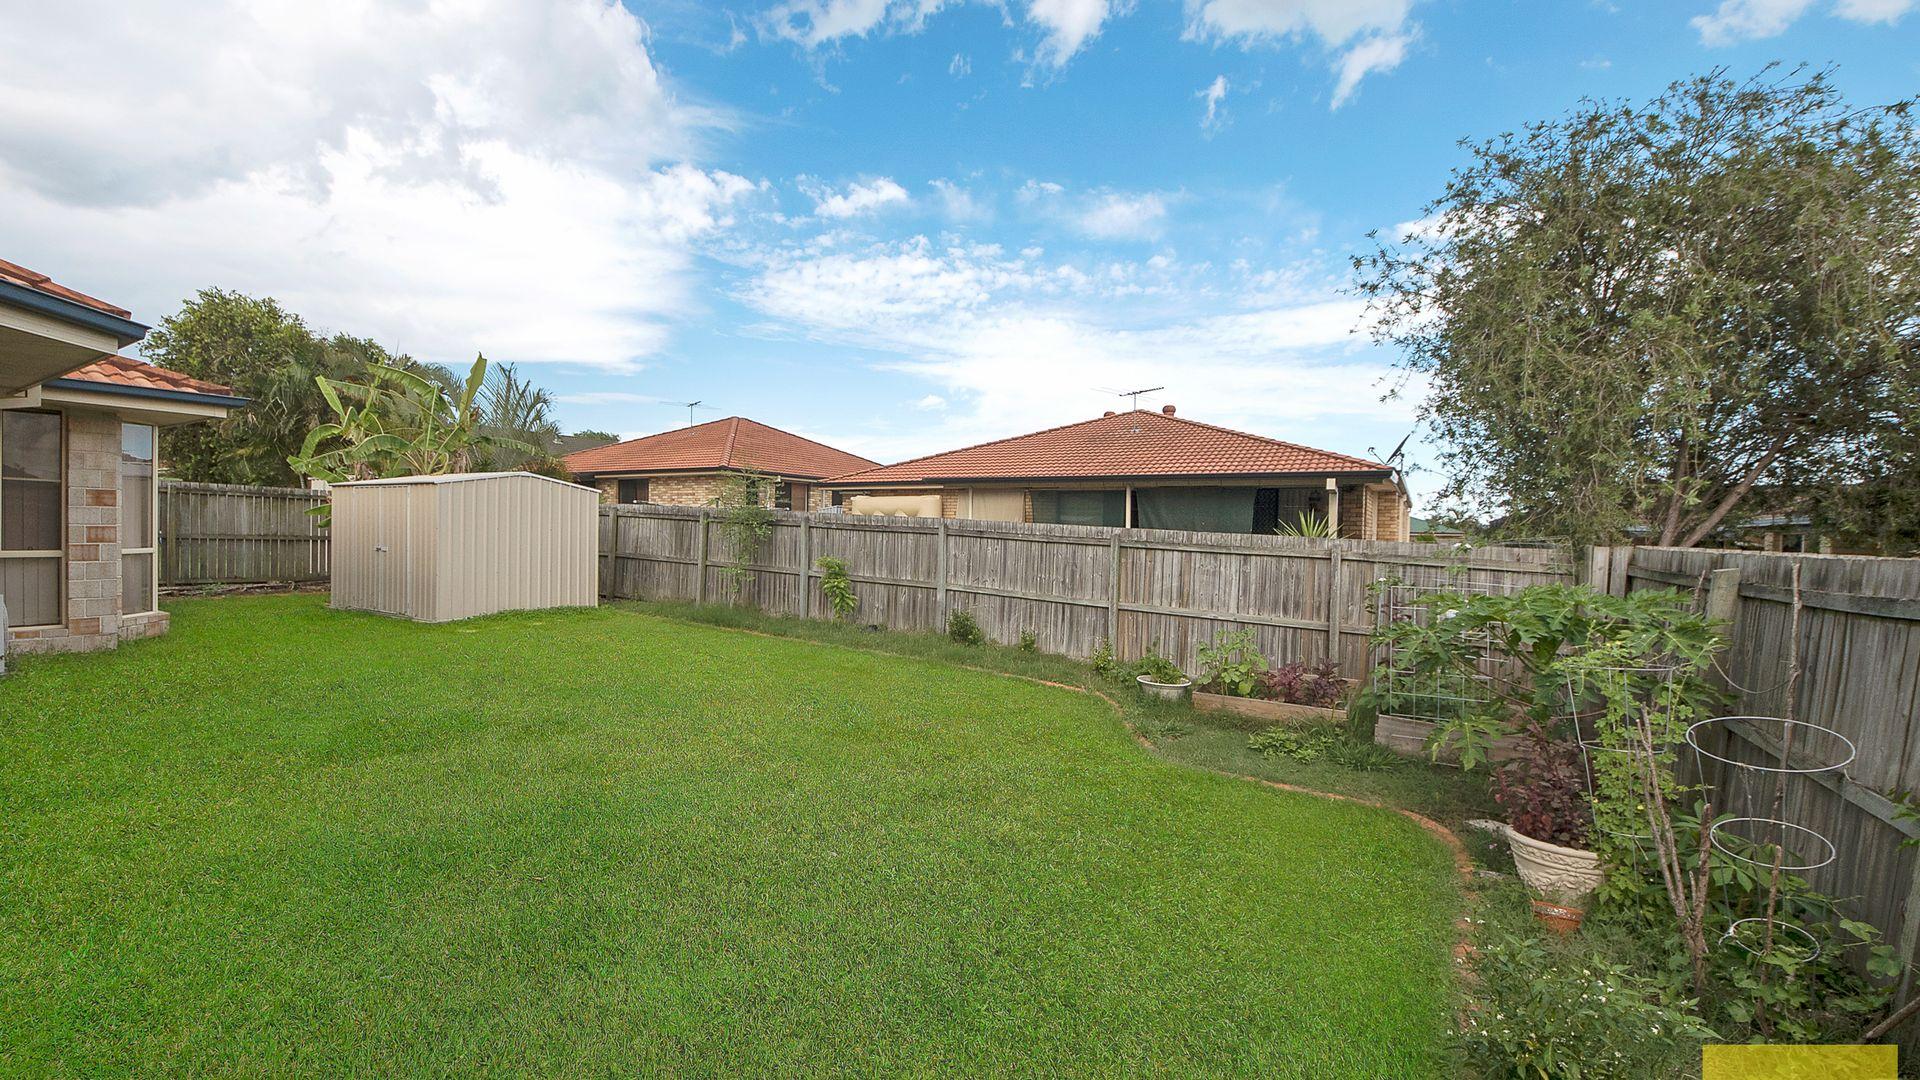 10 Calista Crescent, Bracken Ridge QLD 4017, Image 10